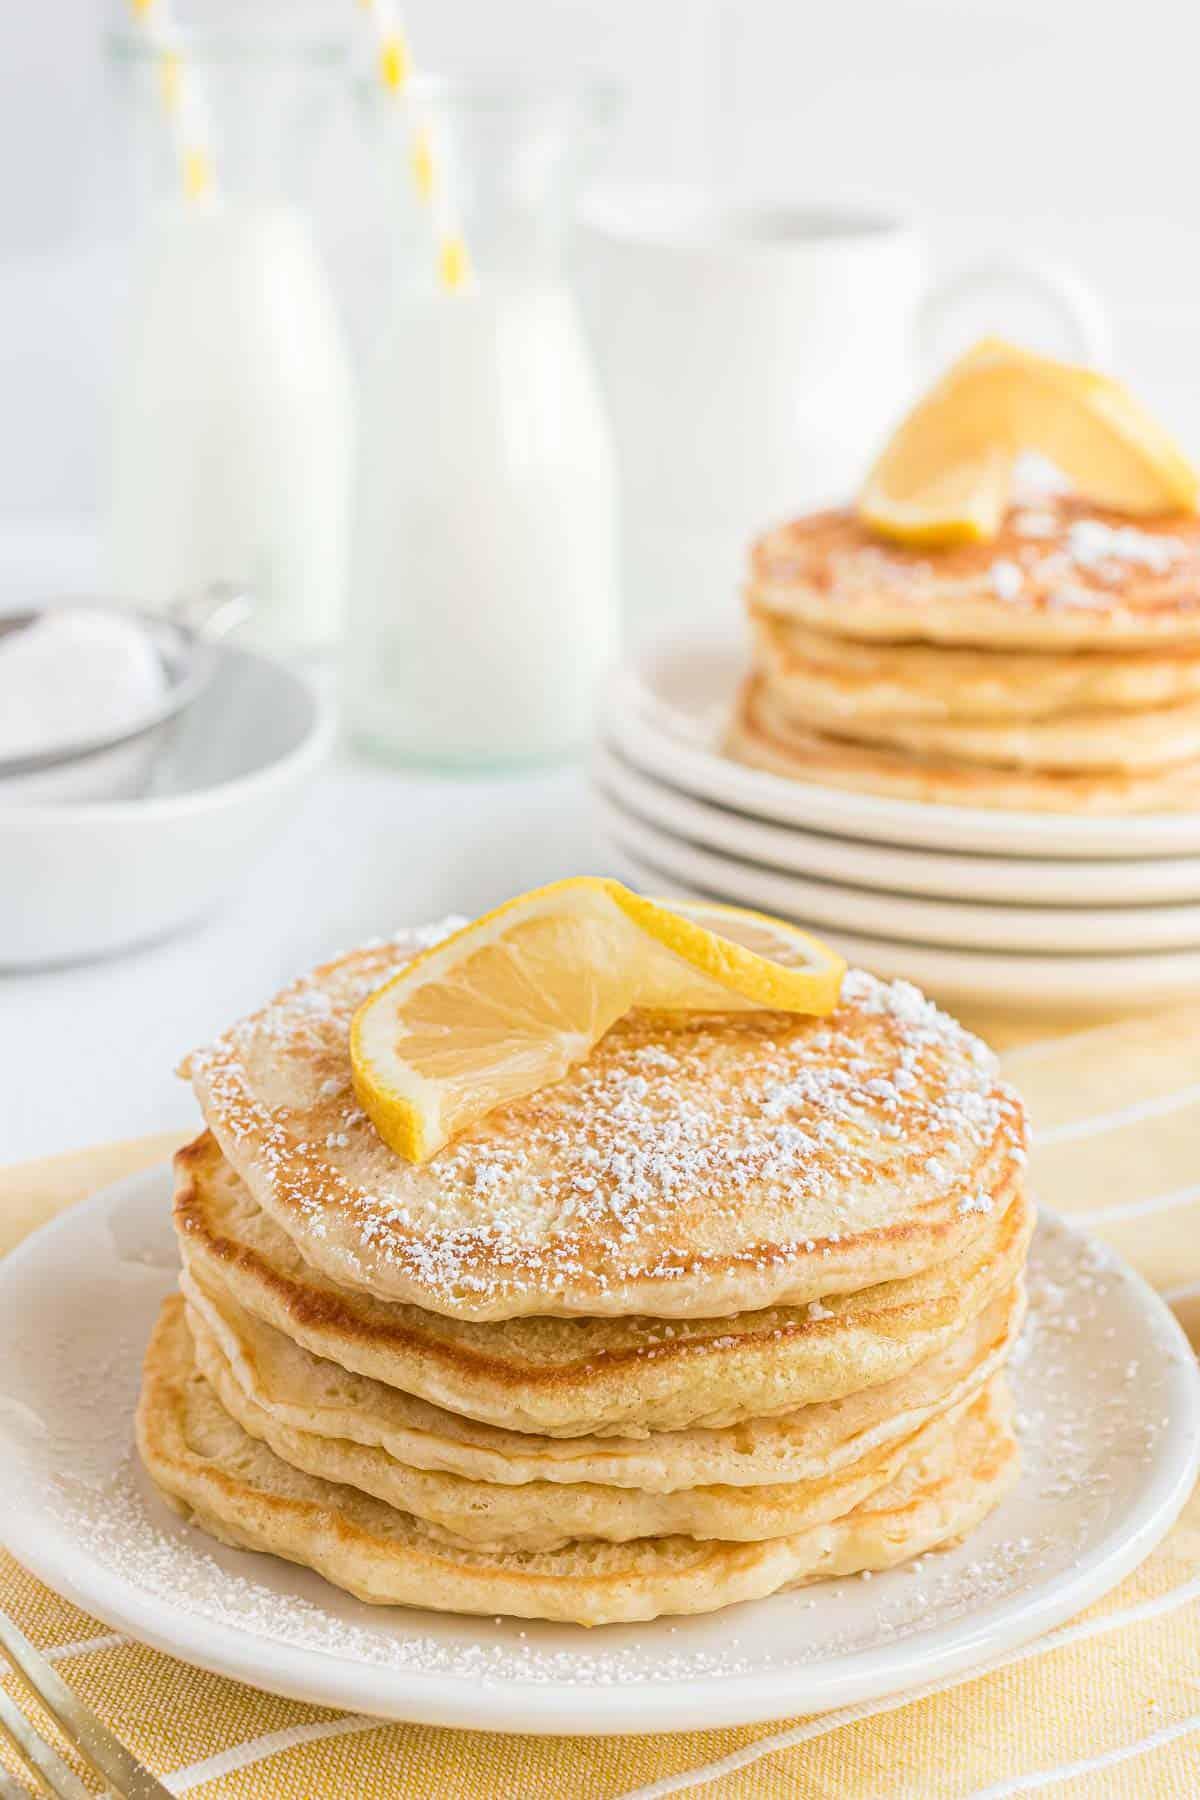 Stack of lemon pancakes topped with powdered sugar and lemon wheel.